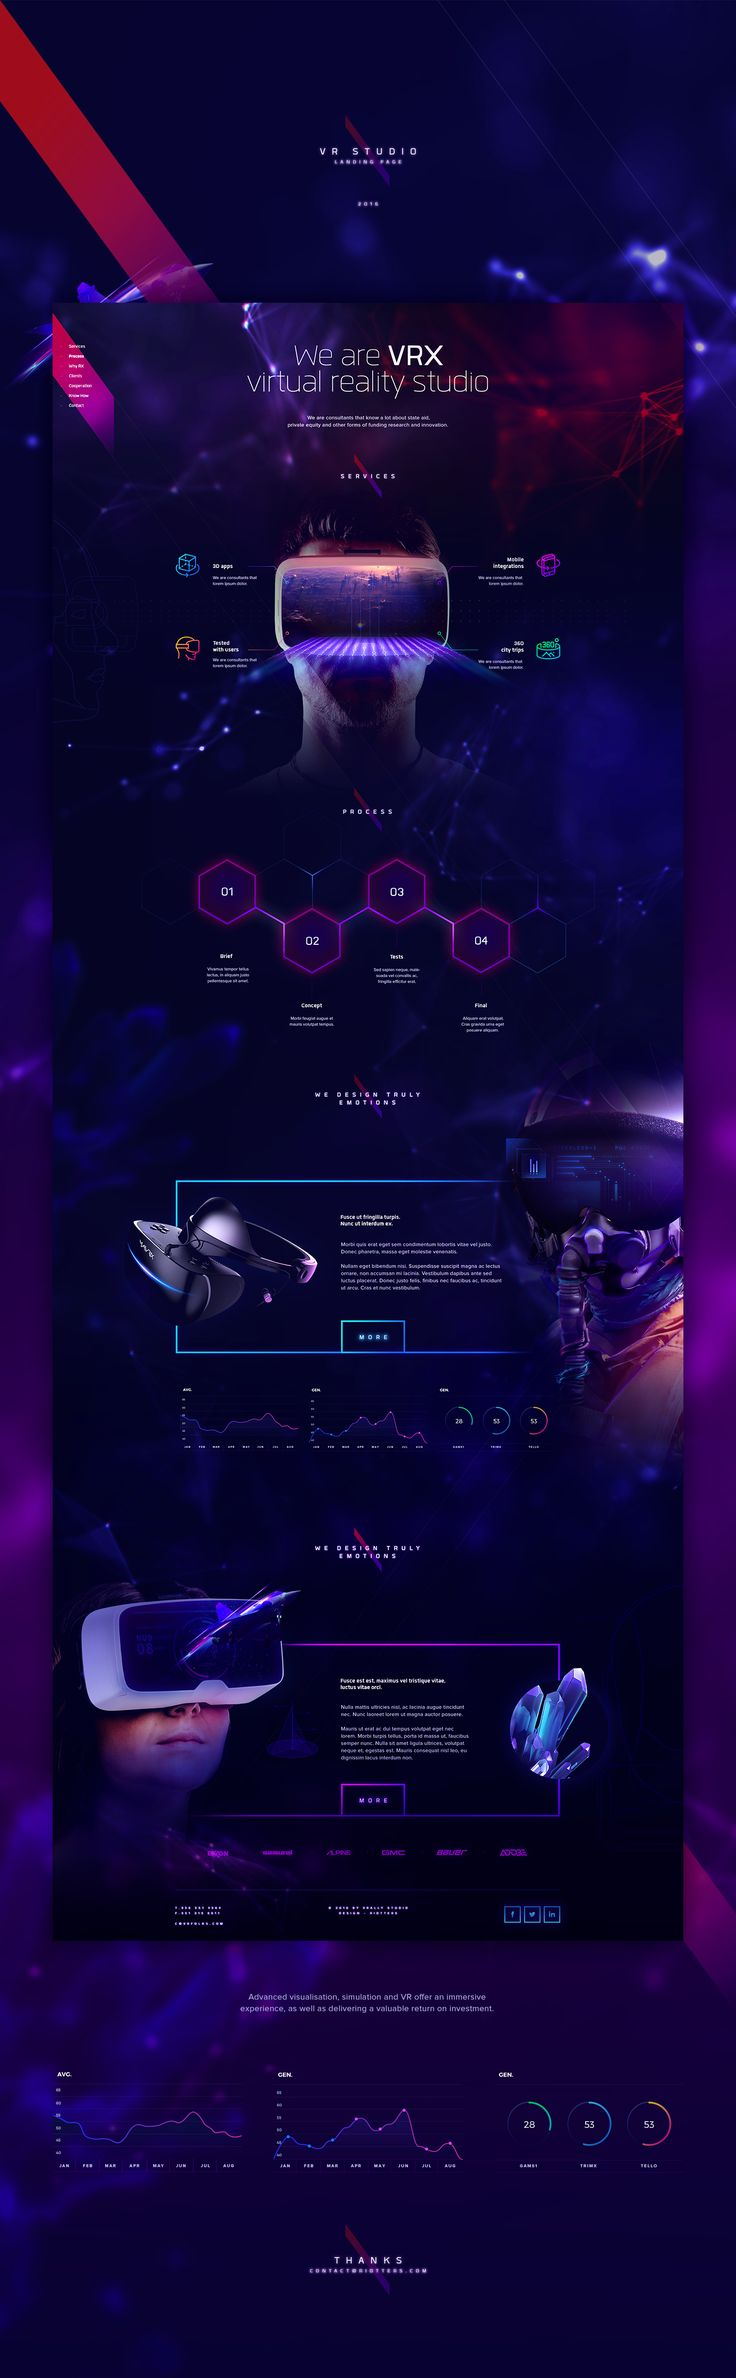 VRX Studio on Behance